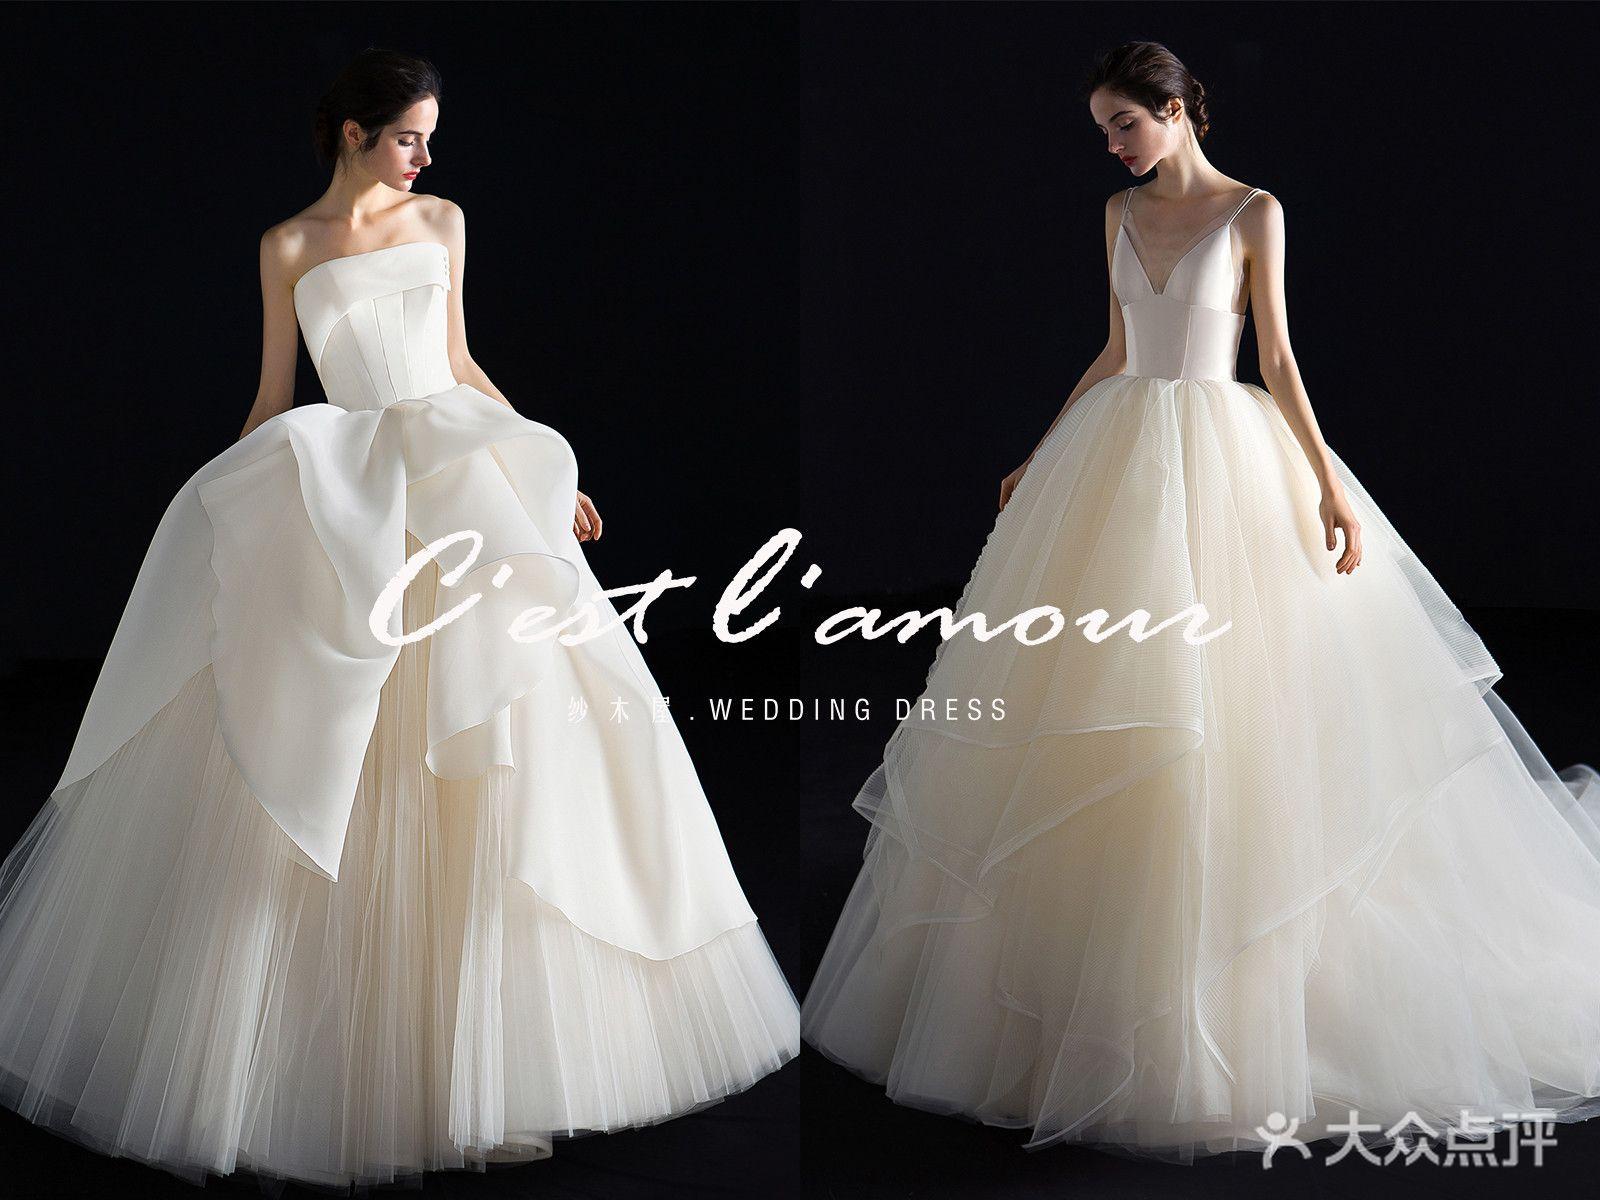 纱木屋C'est L'amour Weddingdress的图片